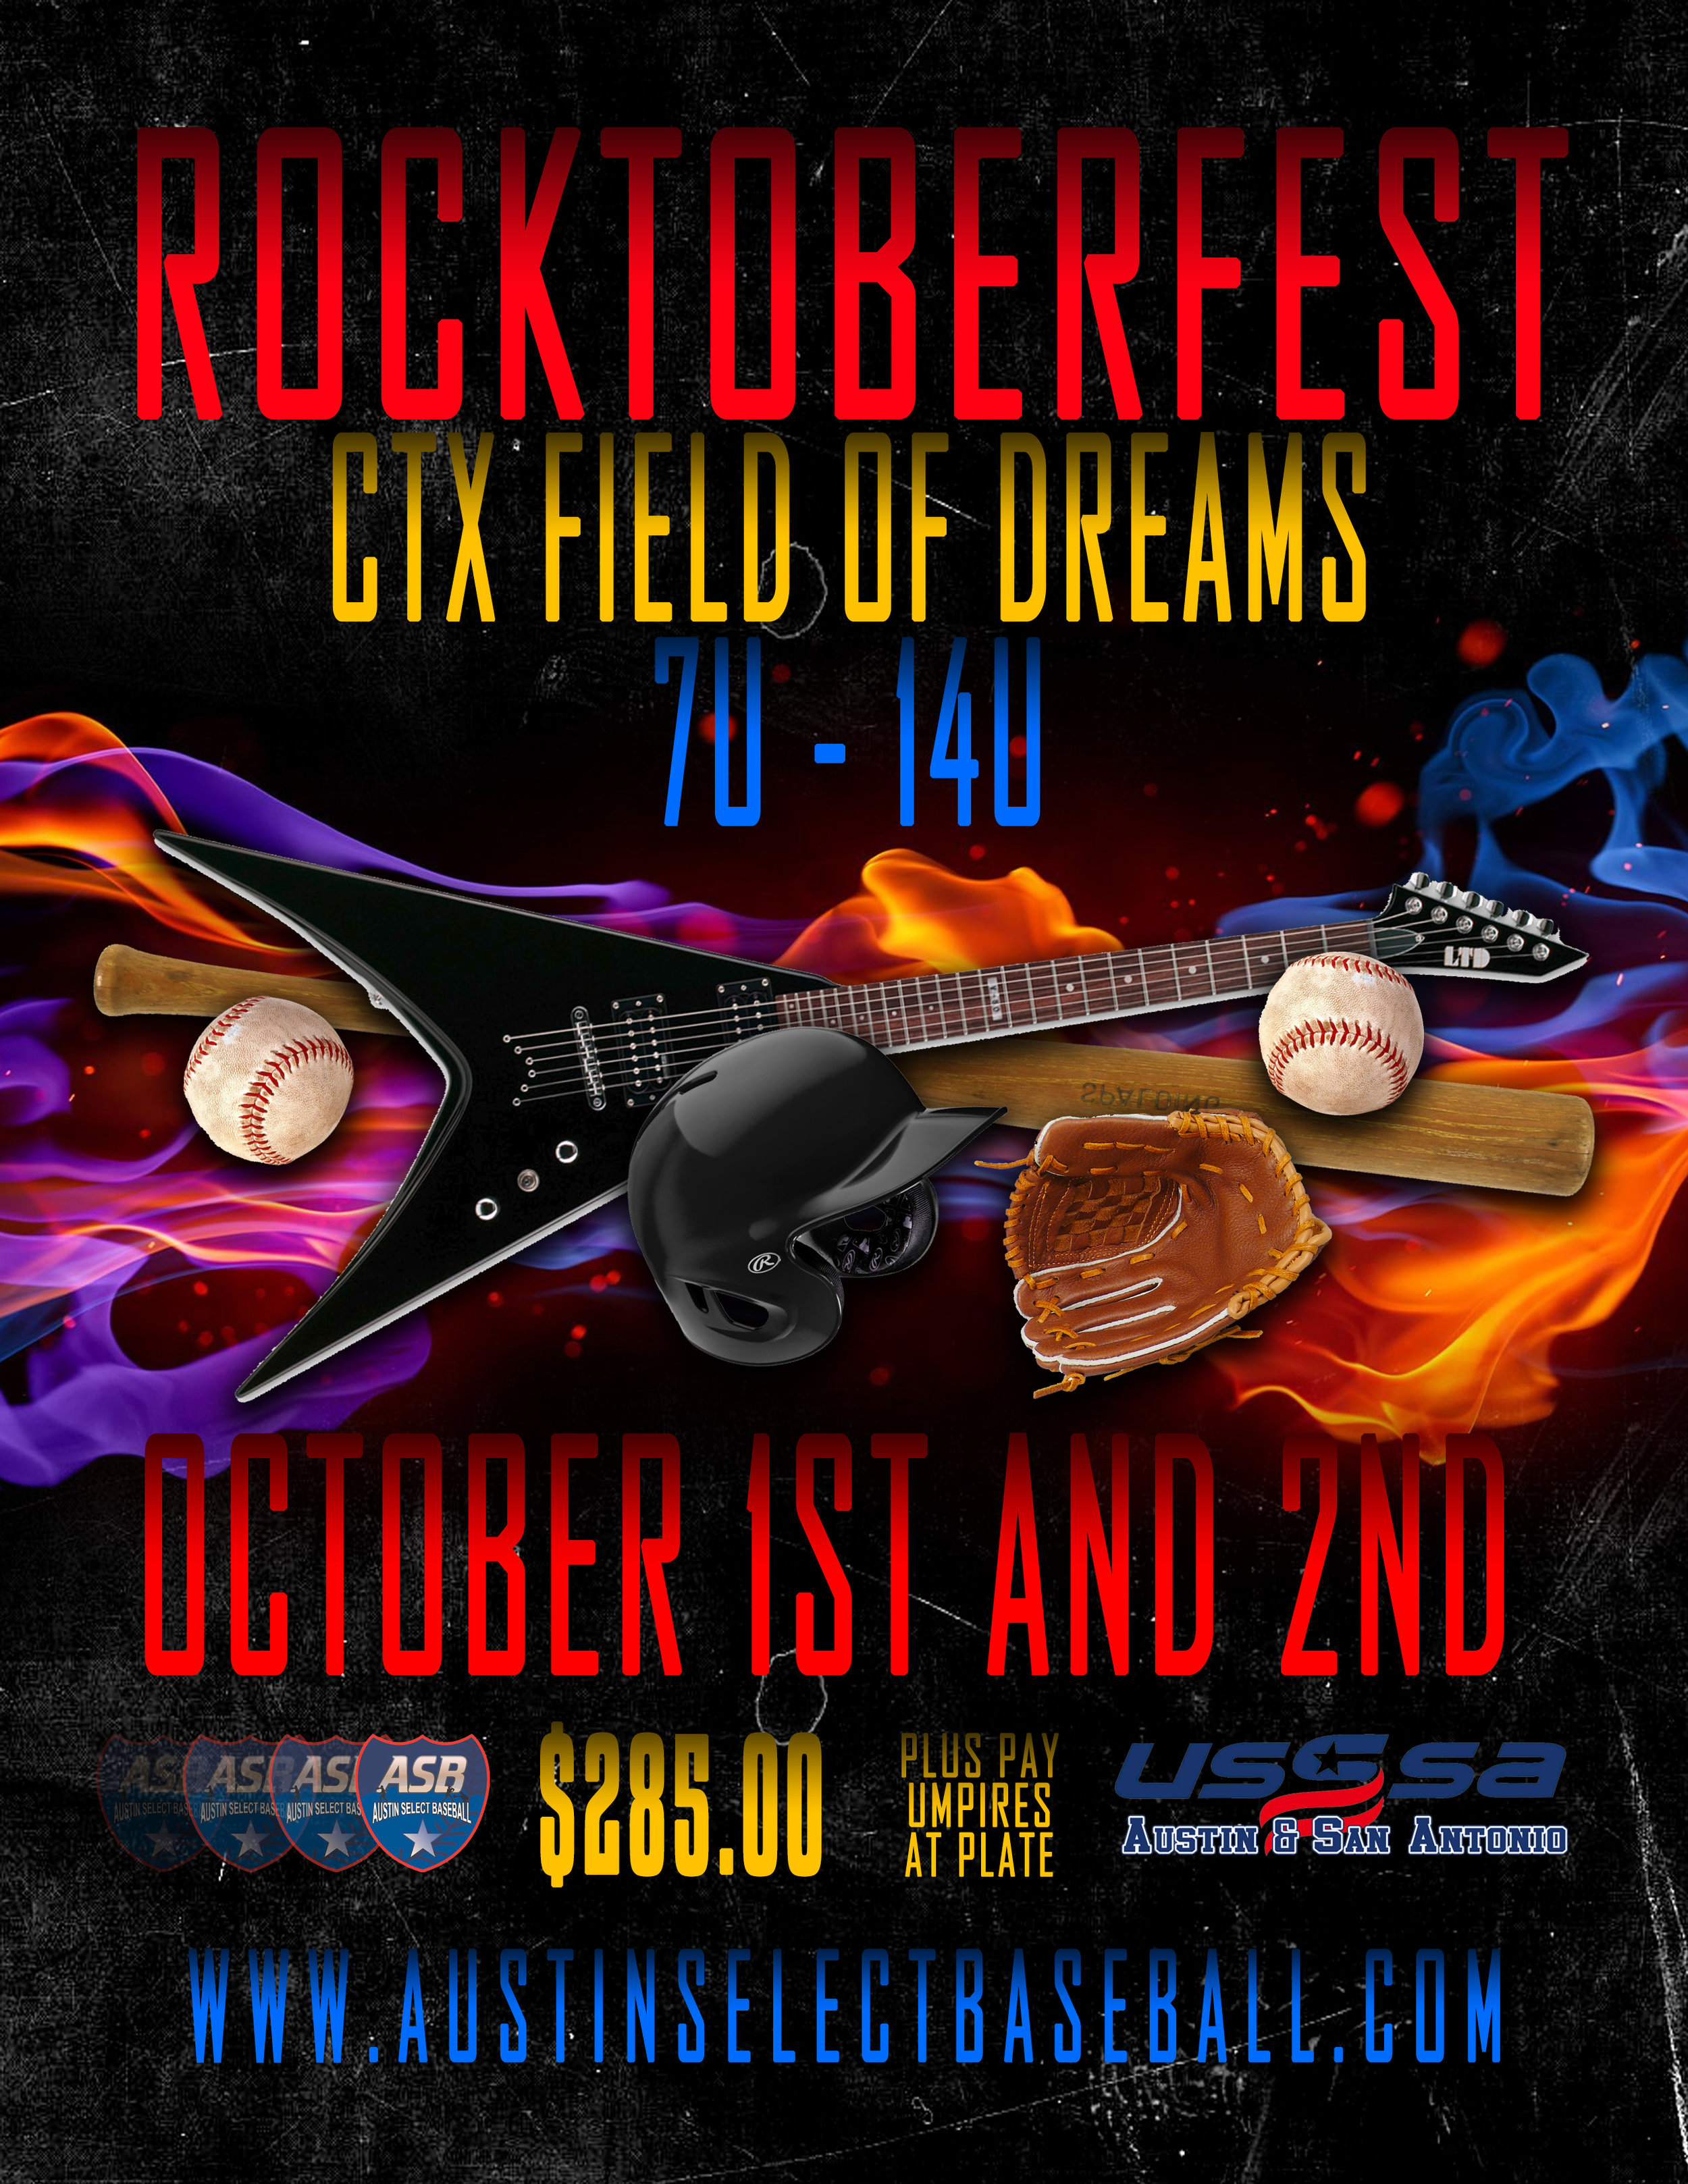 RocktoberFest_Flyer.jpg